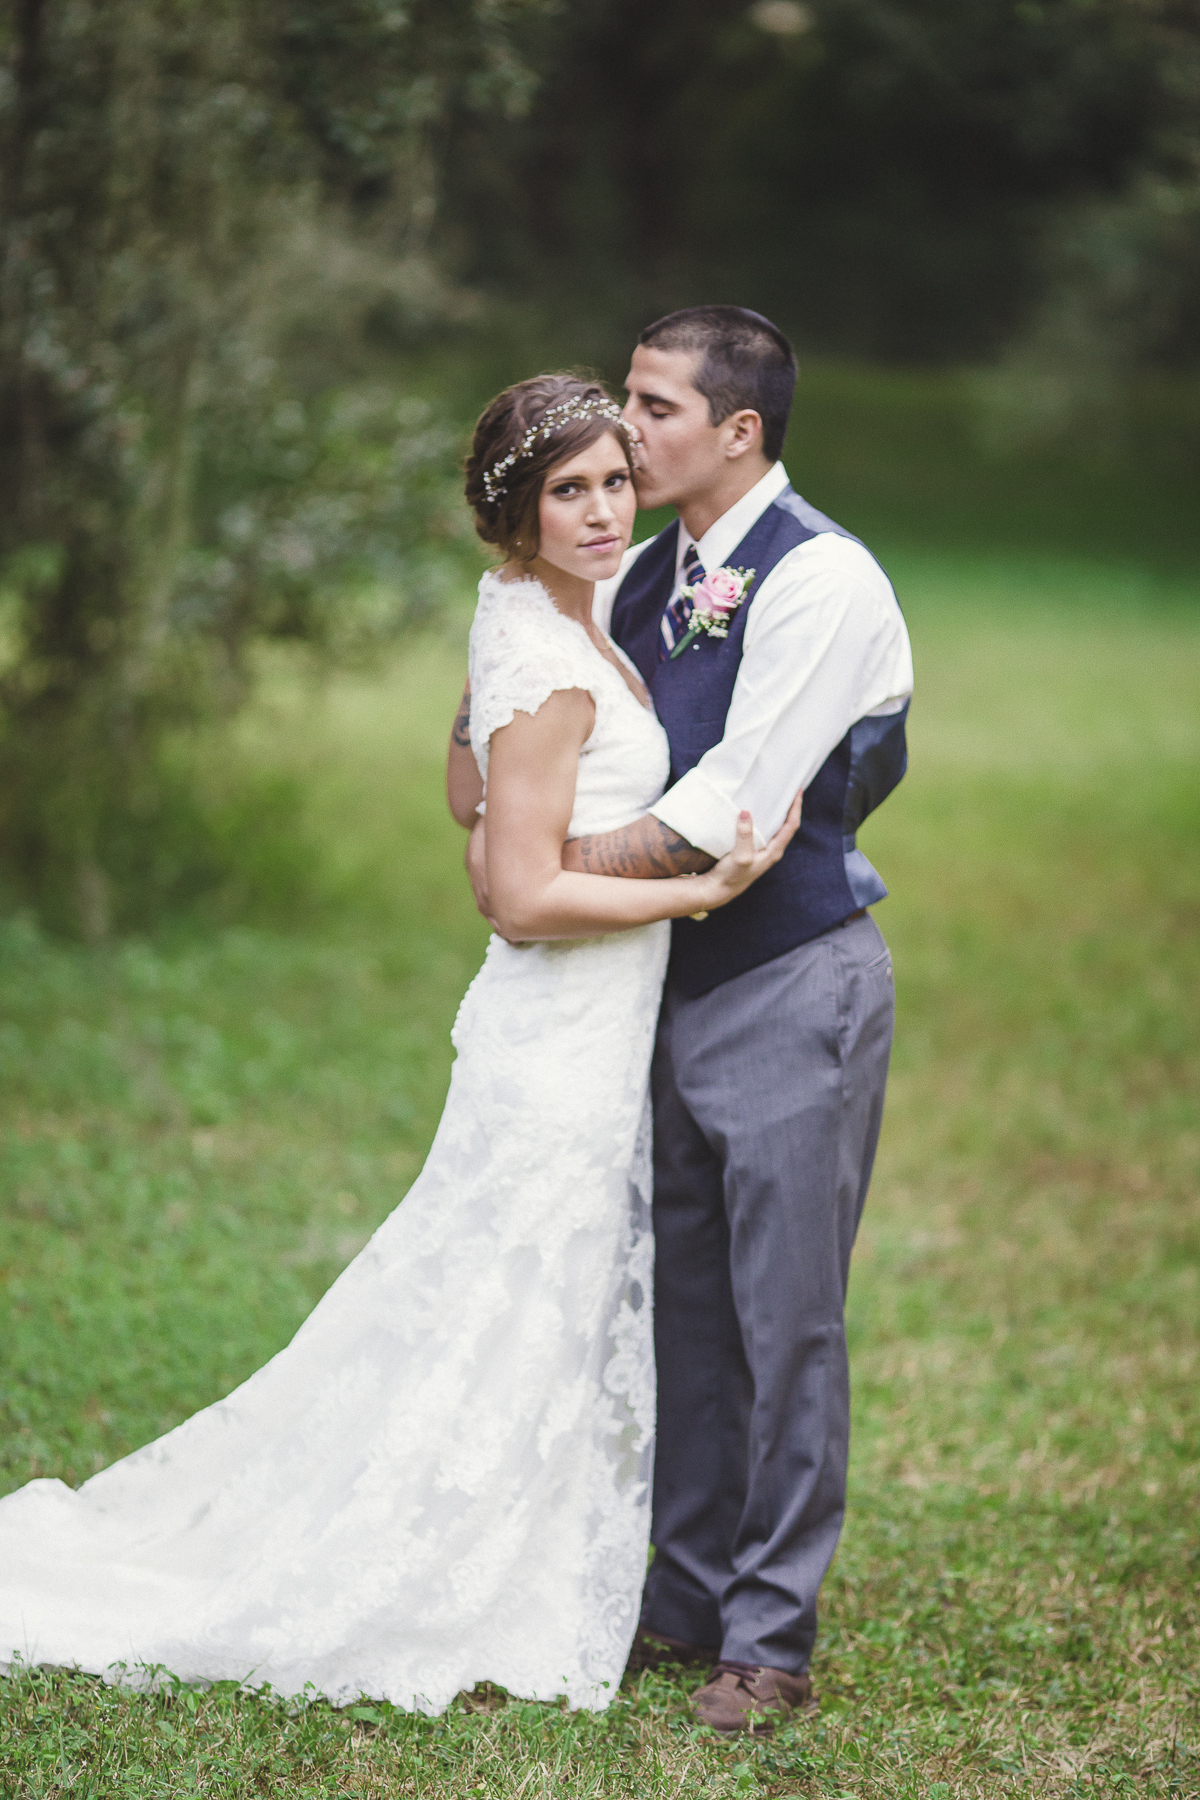 Laurel Gardens Wedding by Christina Maldonado Photography (101 of 143).JPG